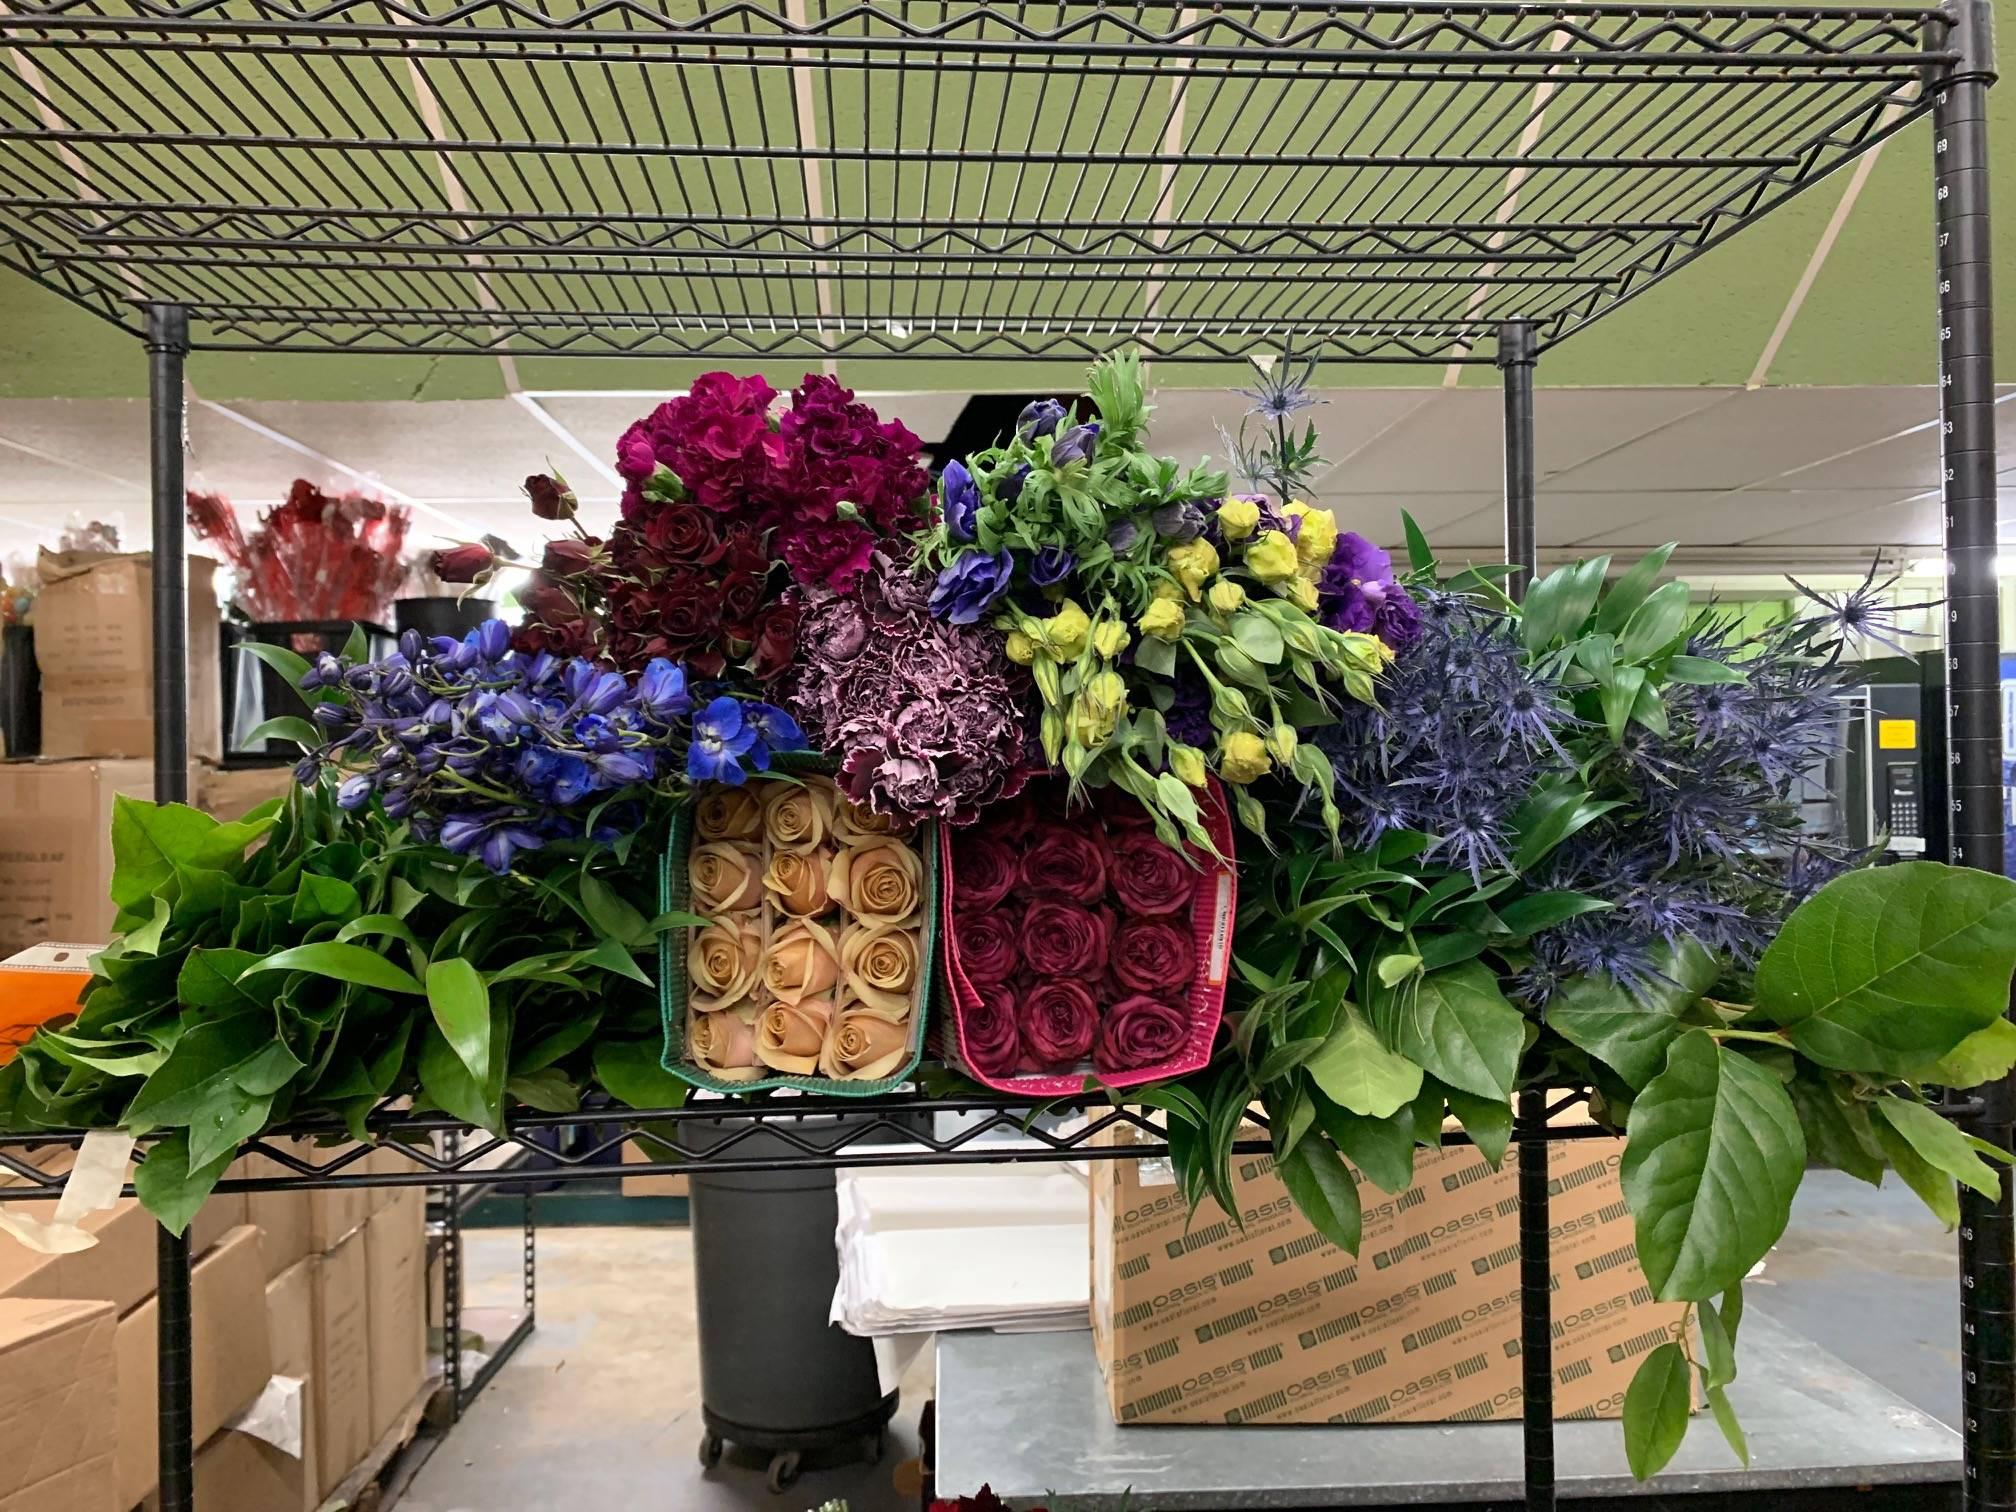 Thistle, Roseberry roses, Golden Mustard roses, salal, purple lisianthus, delphinium, Minerva carnations